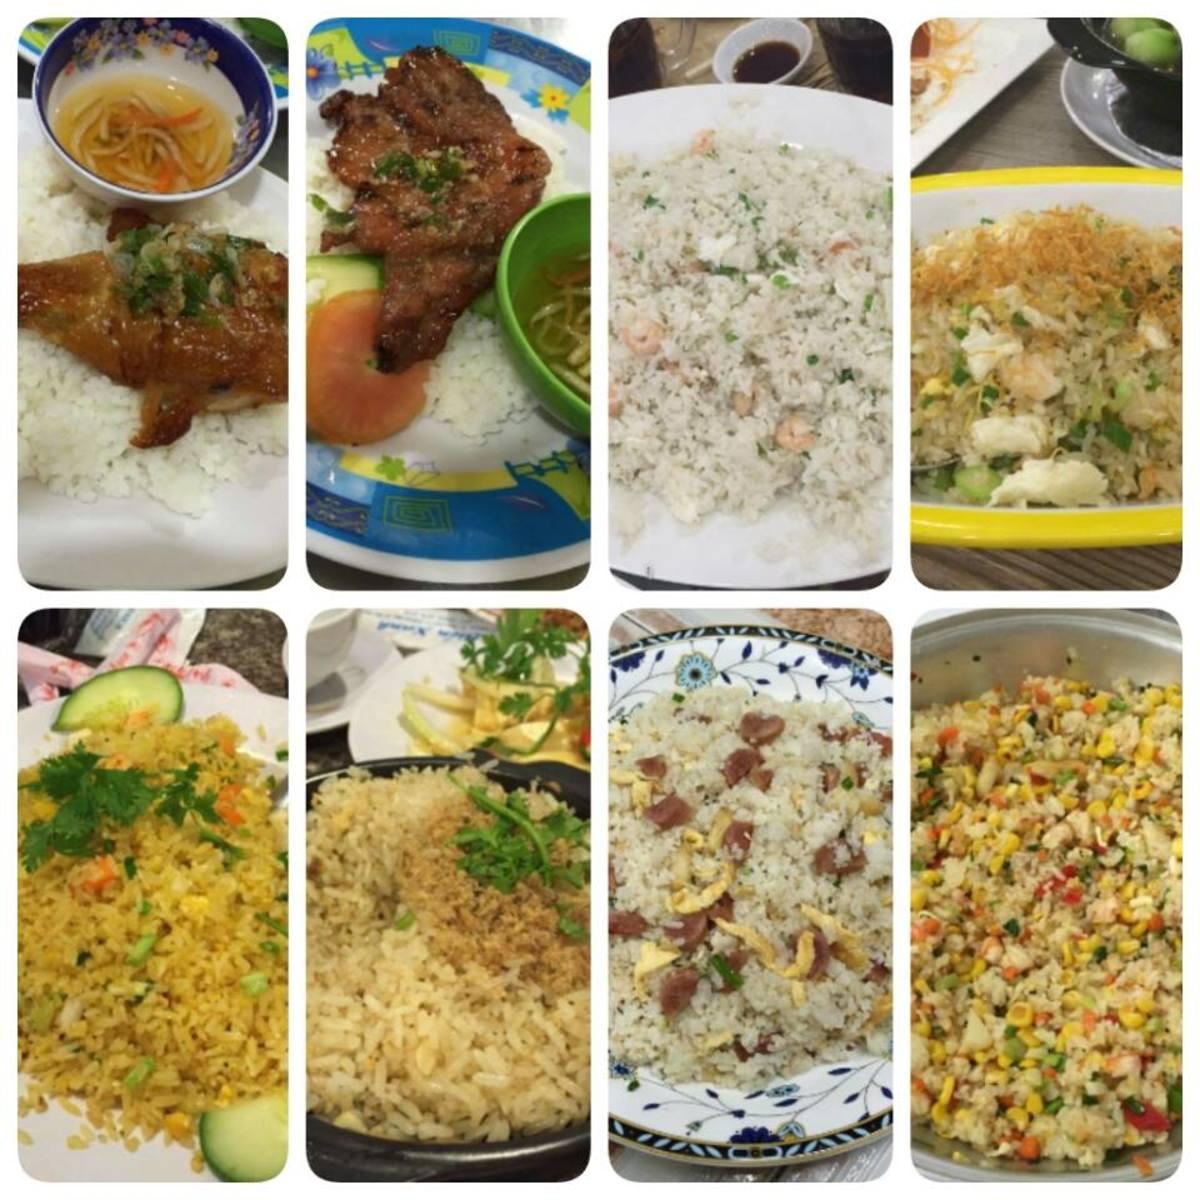 Rice rice!